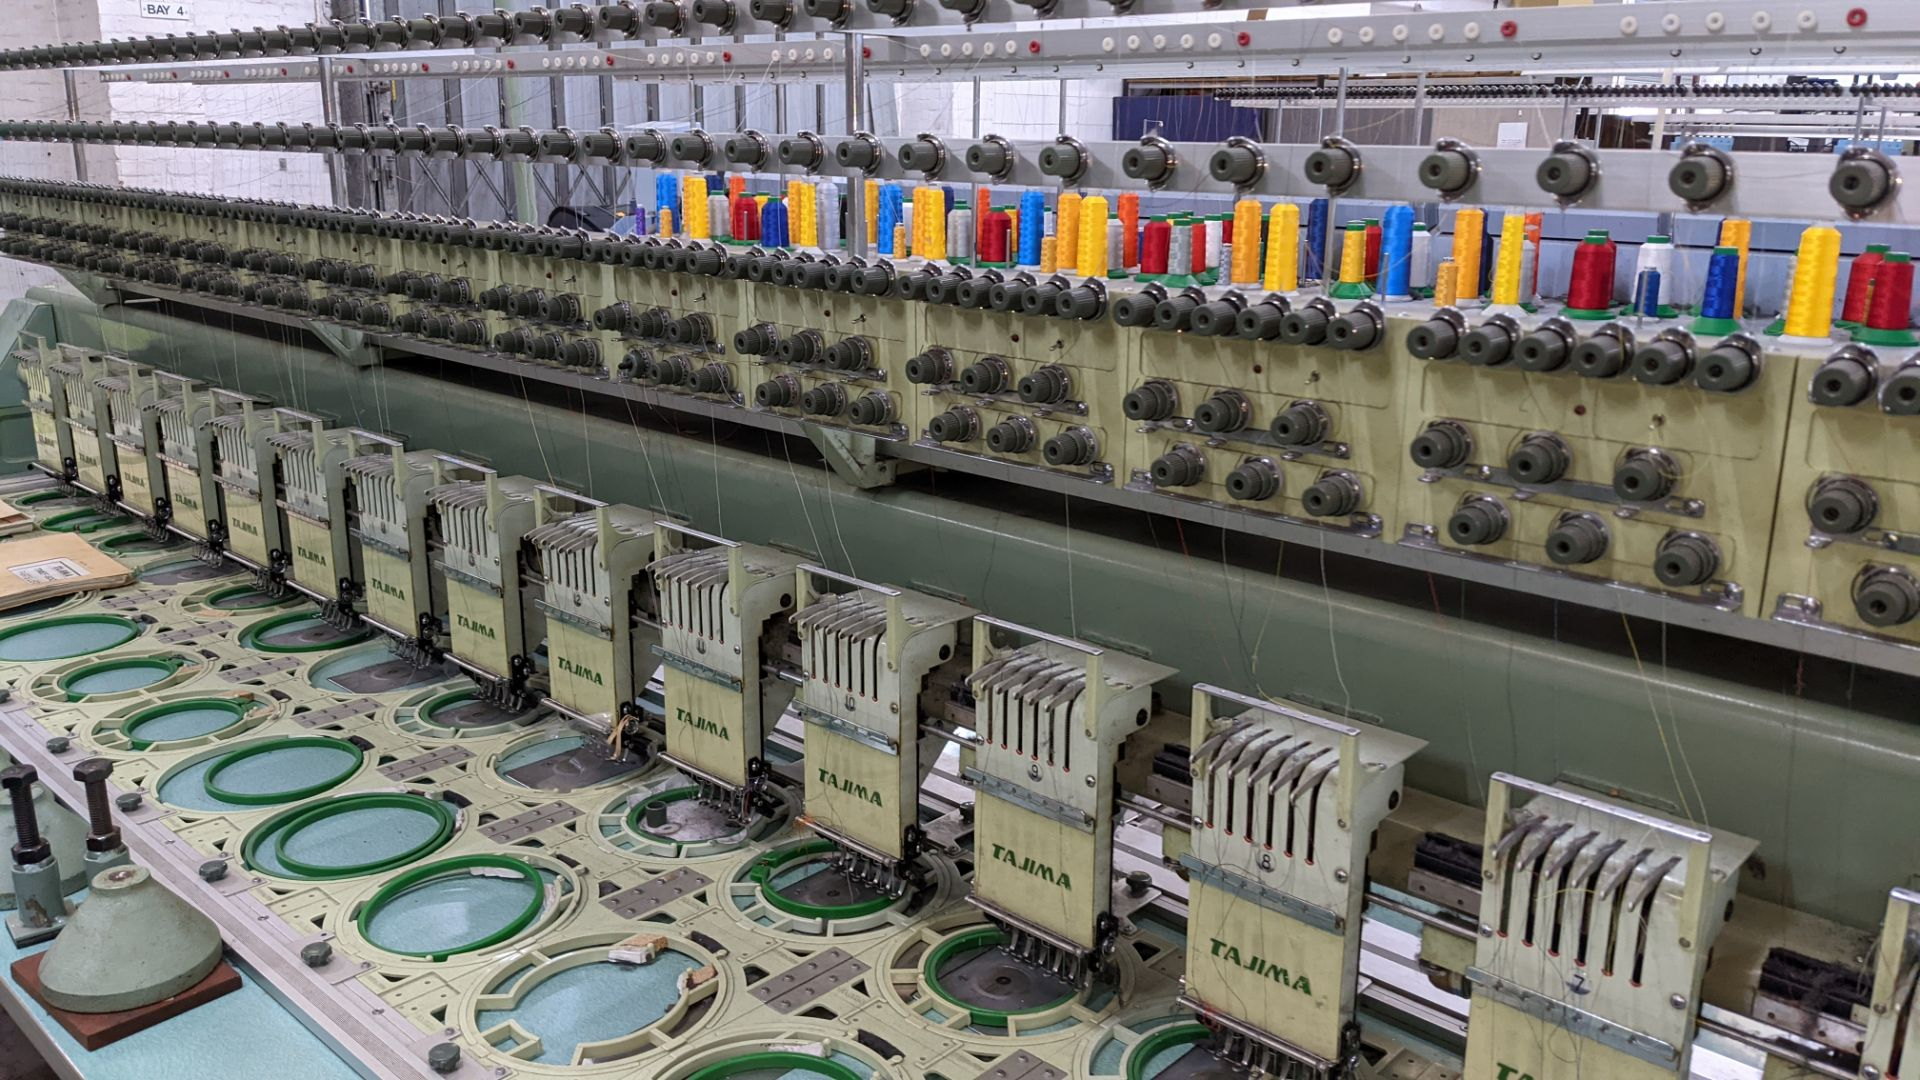 Tokai Tajima electronic 20 head automatic embroidery machine model TMEF-H620 - Image 8 of 25